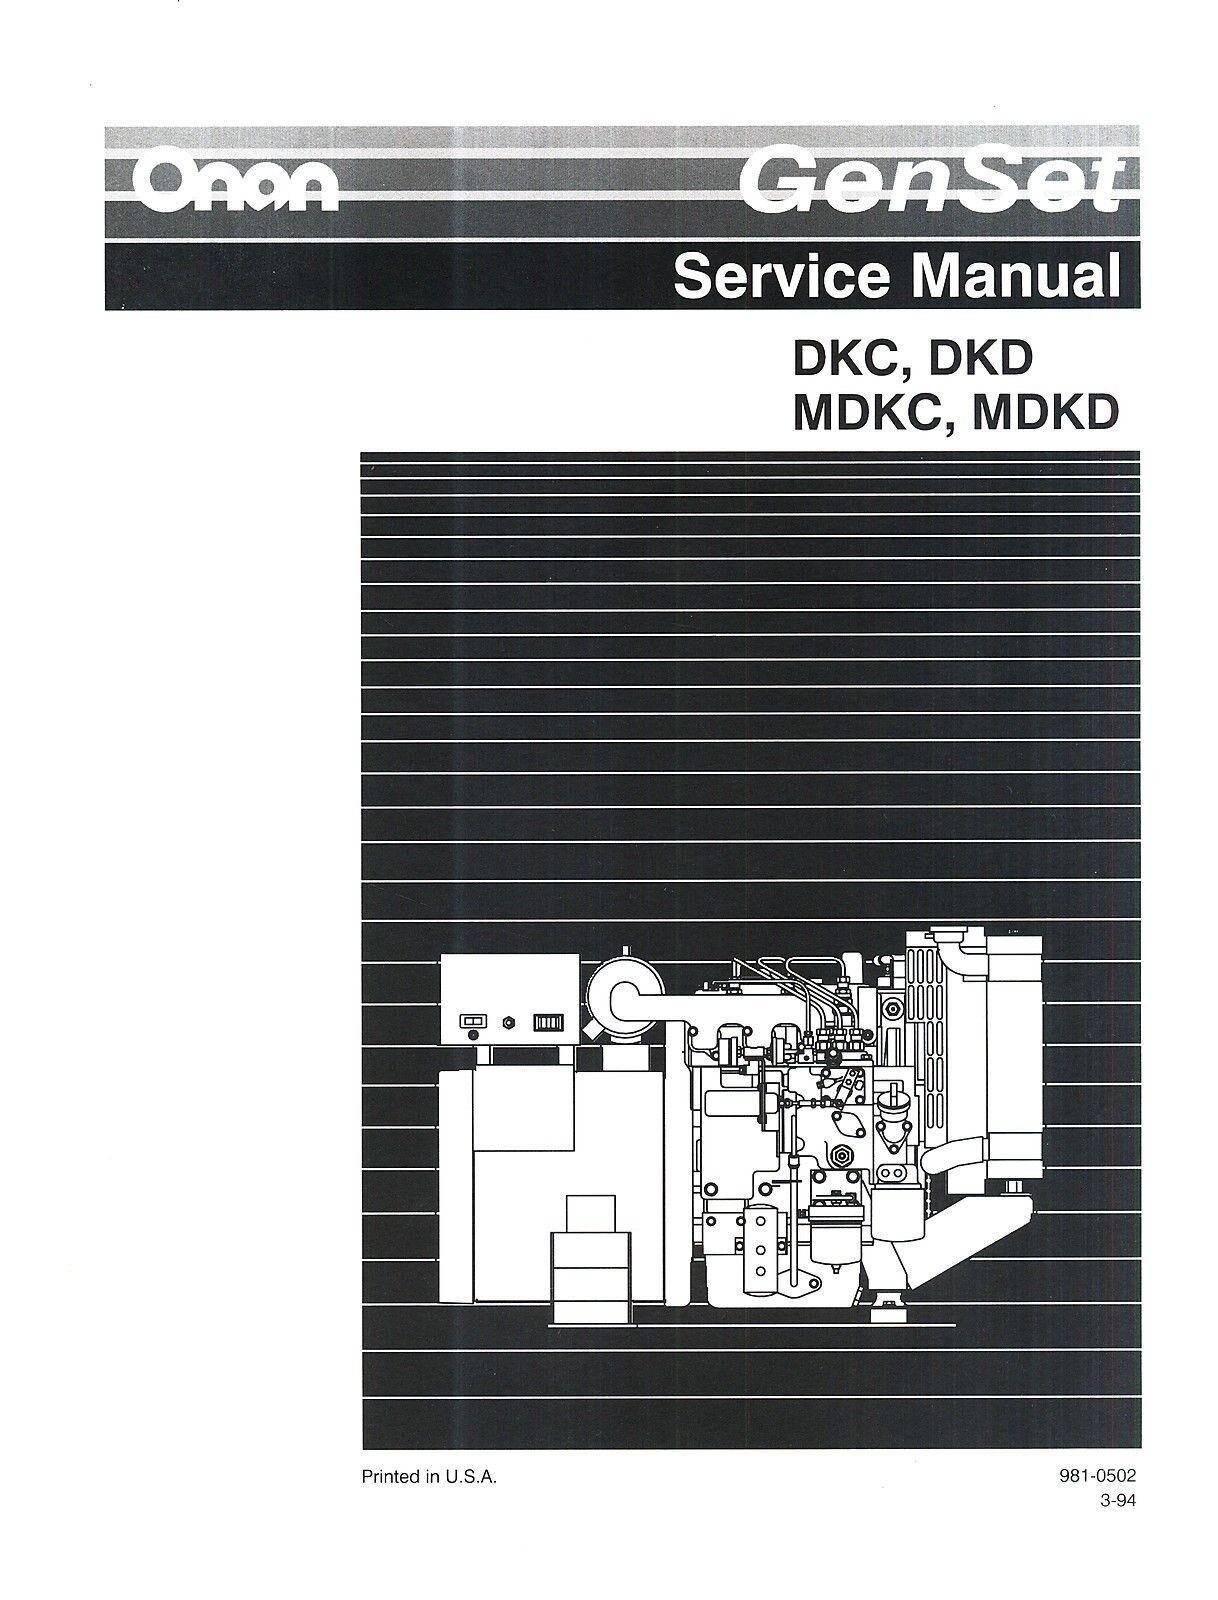 Onan mdkd spec 99999a marine genset illustrated parts list manual.